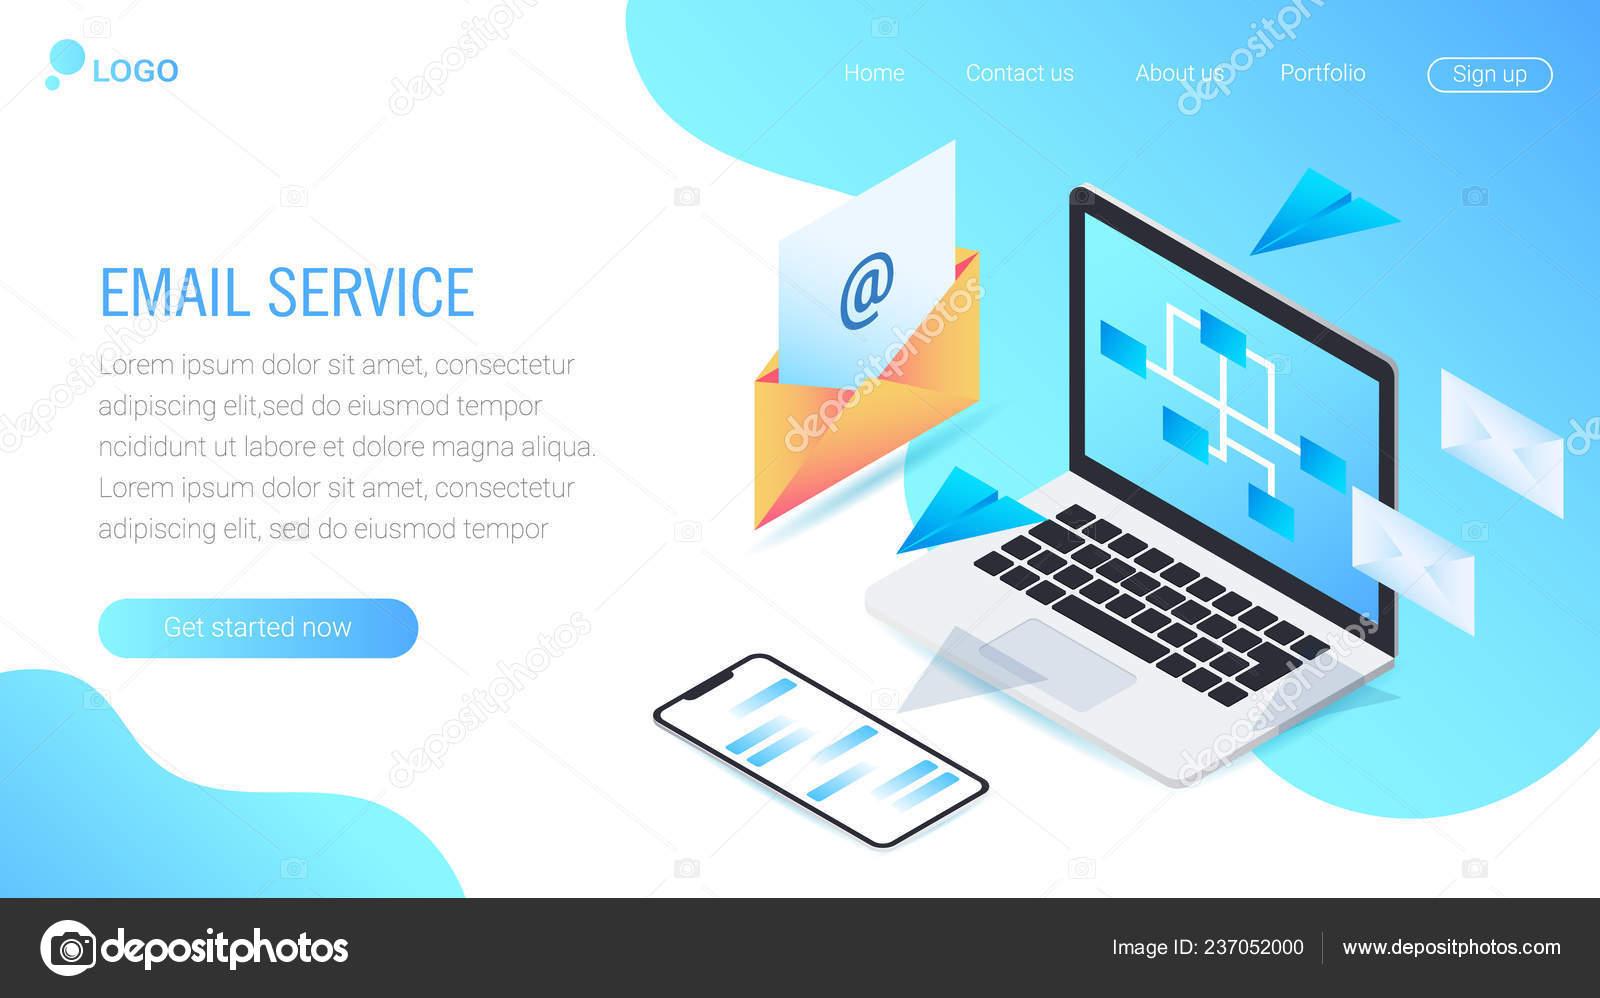 Set Web Page Design Templates Social Media Web Page Design Stock Vector C Anfisa1812 237052000